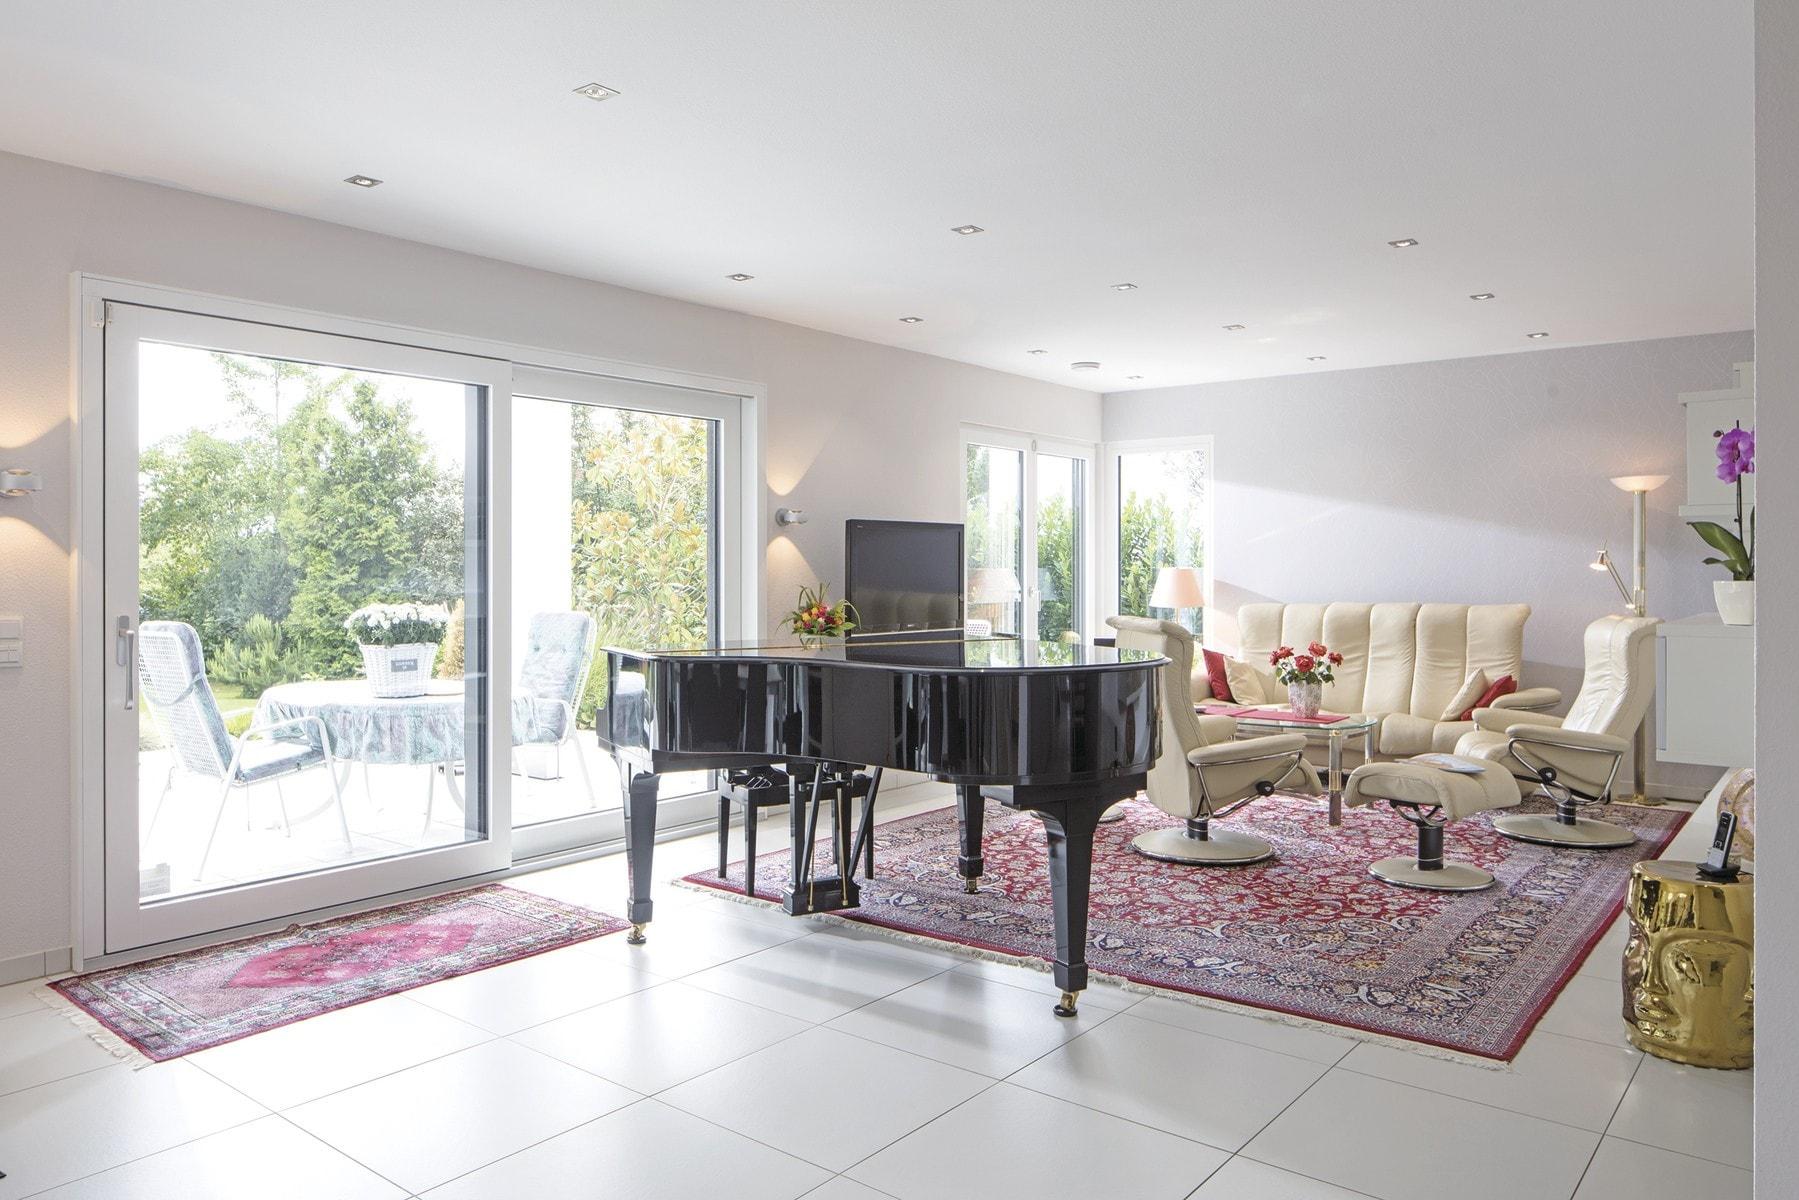 Großes Wohnzimmer mit Piano - Stadtvilla Inneneinrichtung Haus Ideen Fertighaus CityLife WeberHaus - HausbauDirekt.de